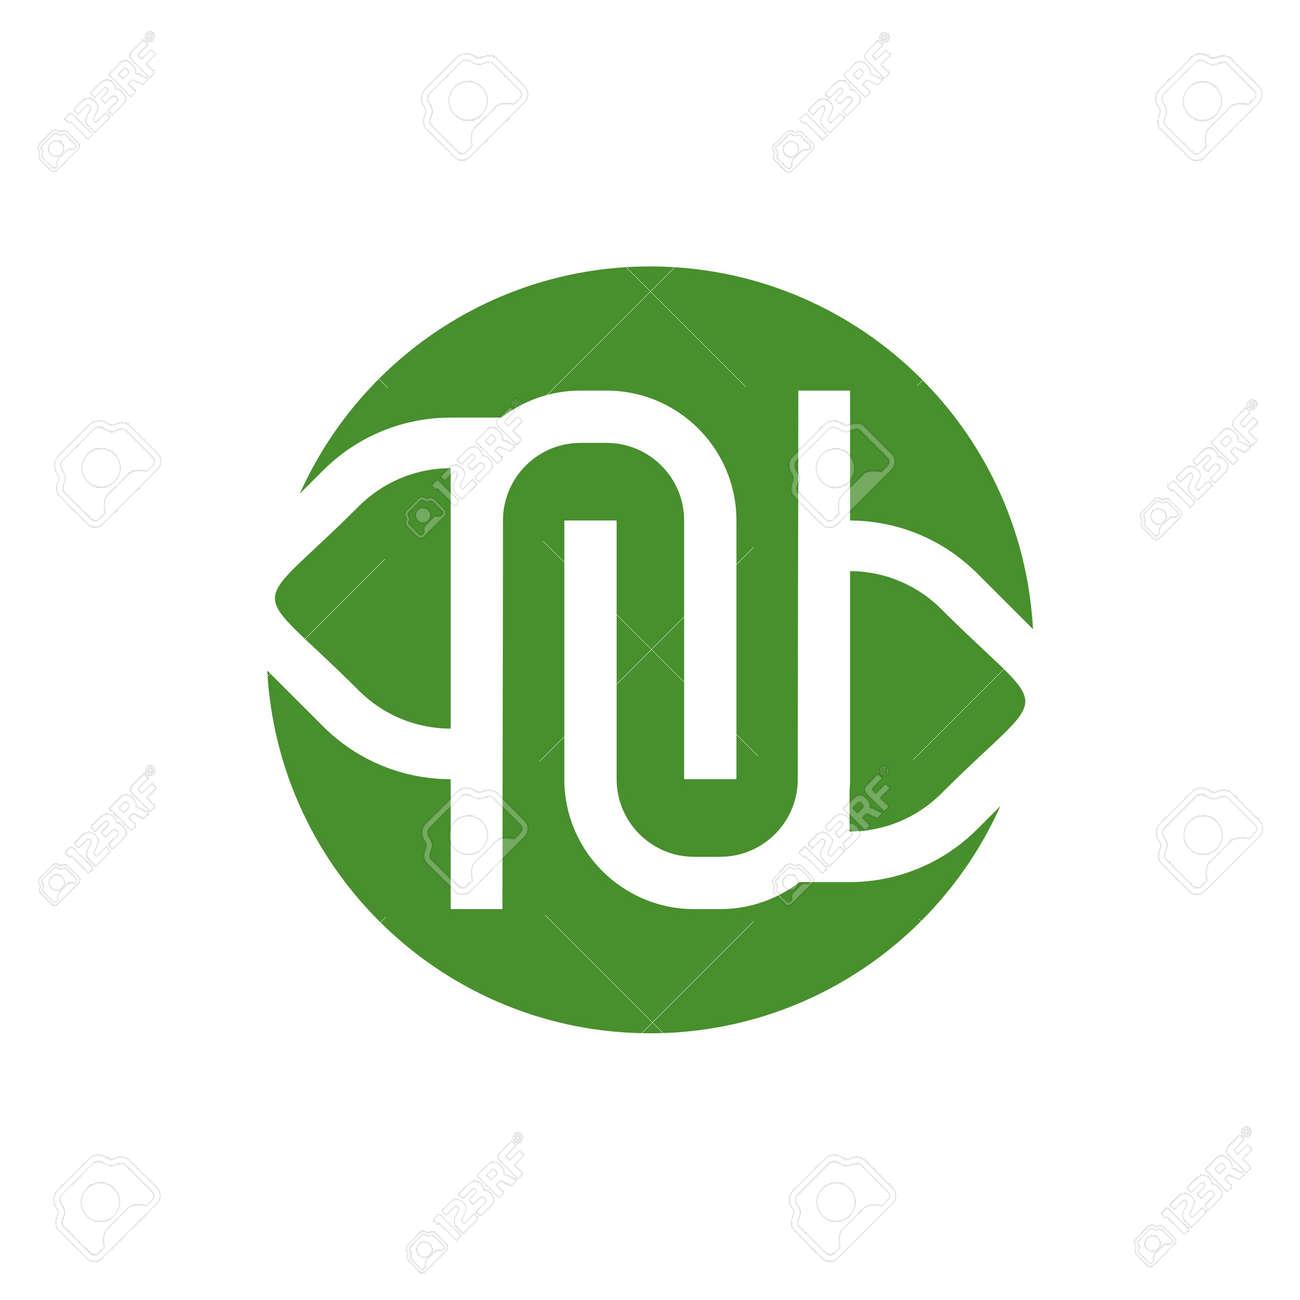 Logo design company name letter n symbol icon royalty free logo design company name letter n symbol icon stock vector 45283494 buycottarizona